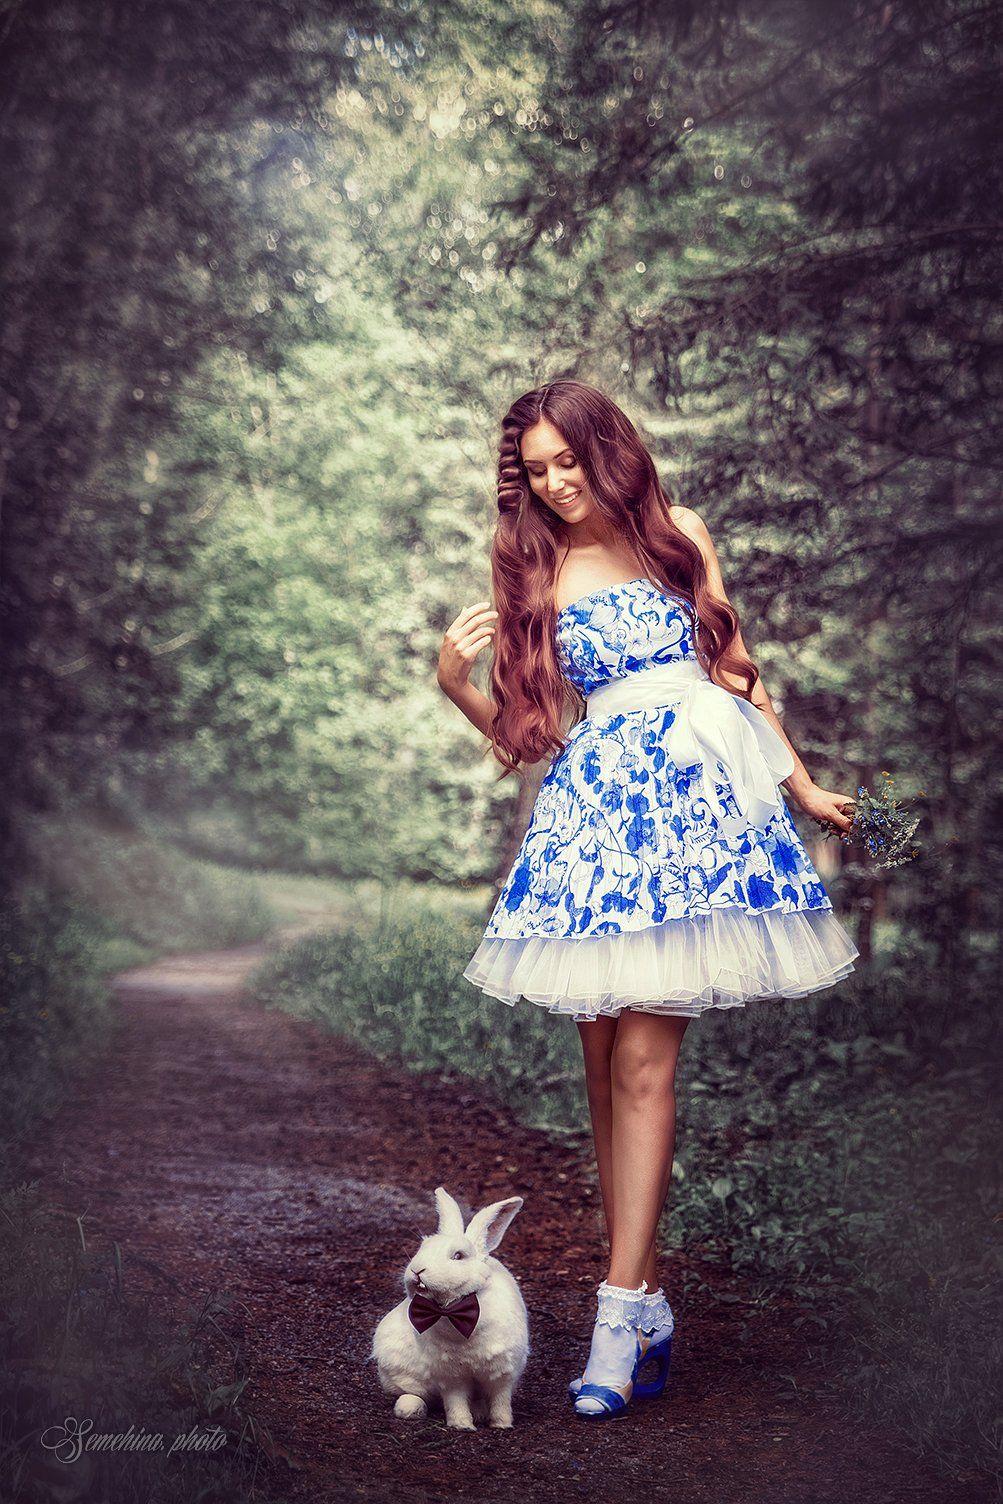 девушка, портрет, кролик, алиса, сказка, тропинка, лес, girl, portreit, rabbit, fairy tale, path, wood, Марина Семёхина